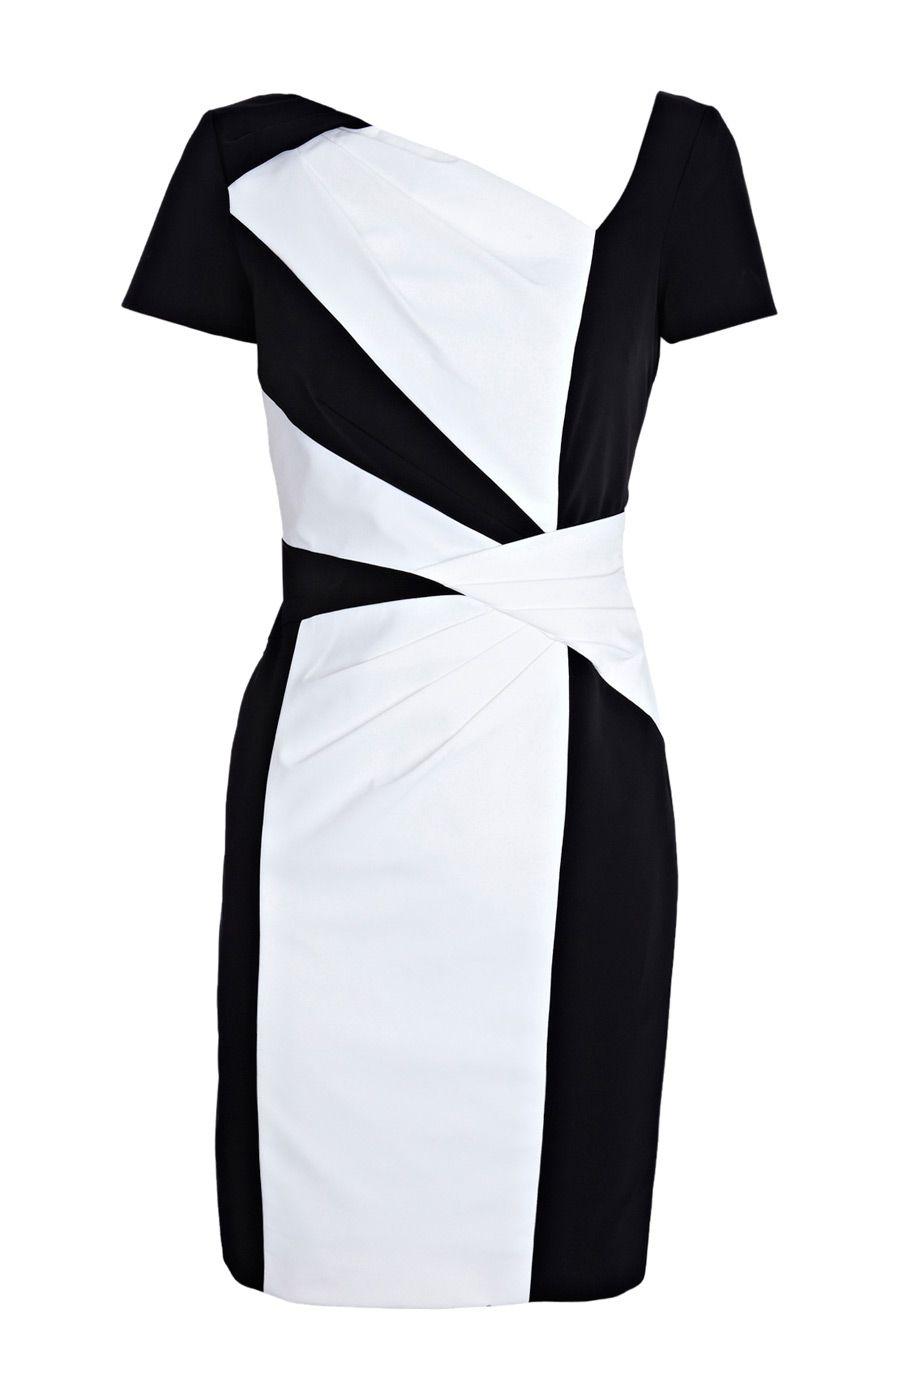 Très black and white clothing | Karen Millen Graphic Colour Block Dress  UJ09